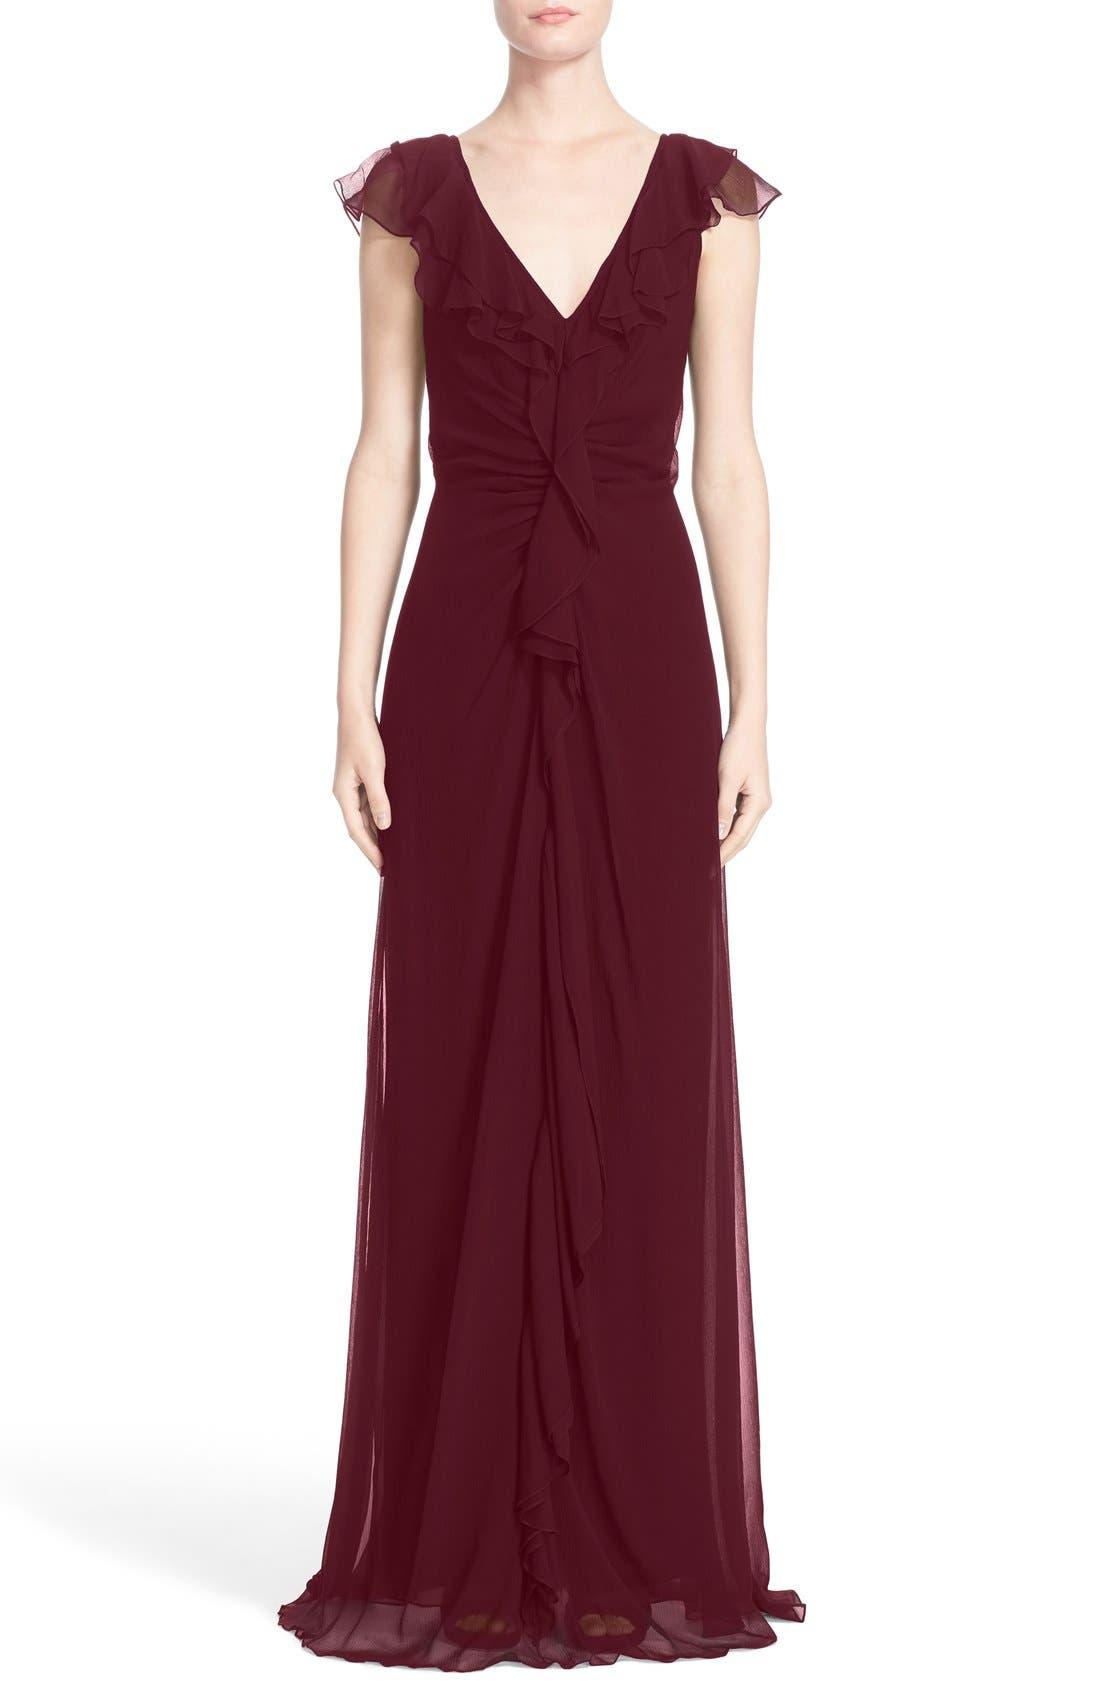 Alternate Image 1 Selected - Carolina Herrera Ruffle Detail Silk Chiffon V-Neck Gown